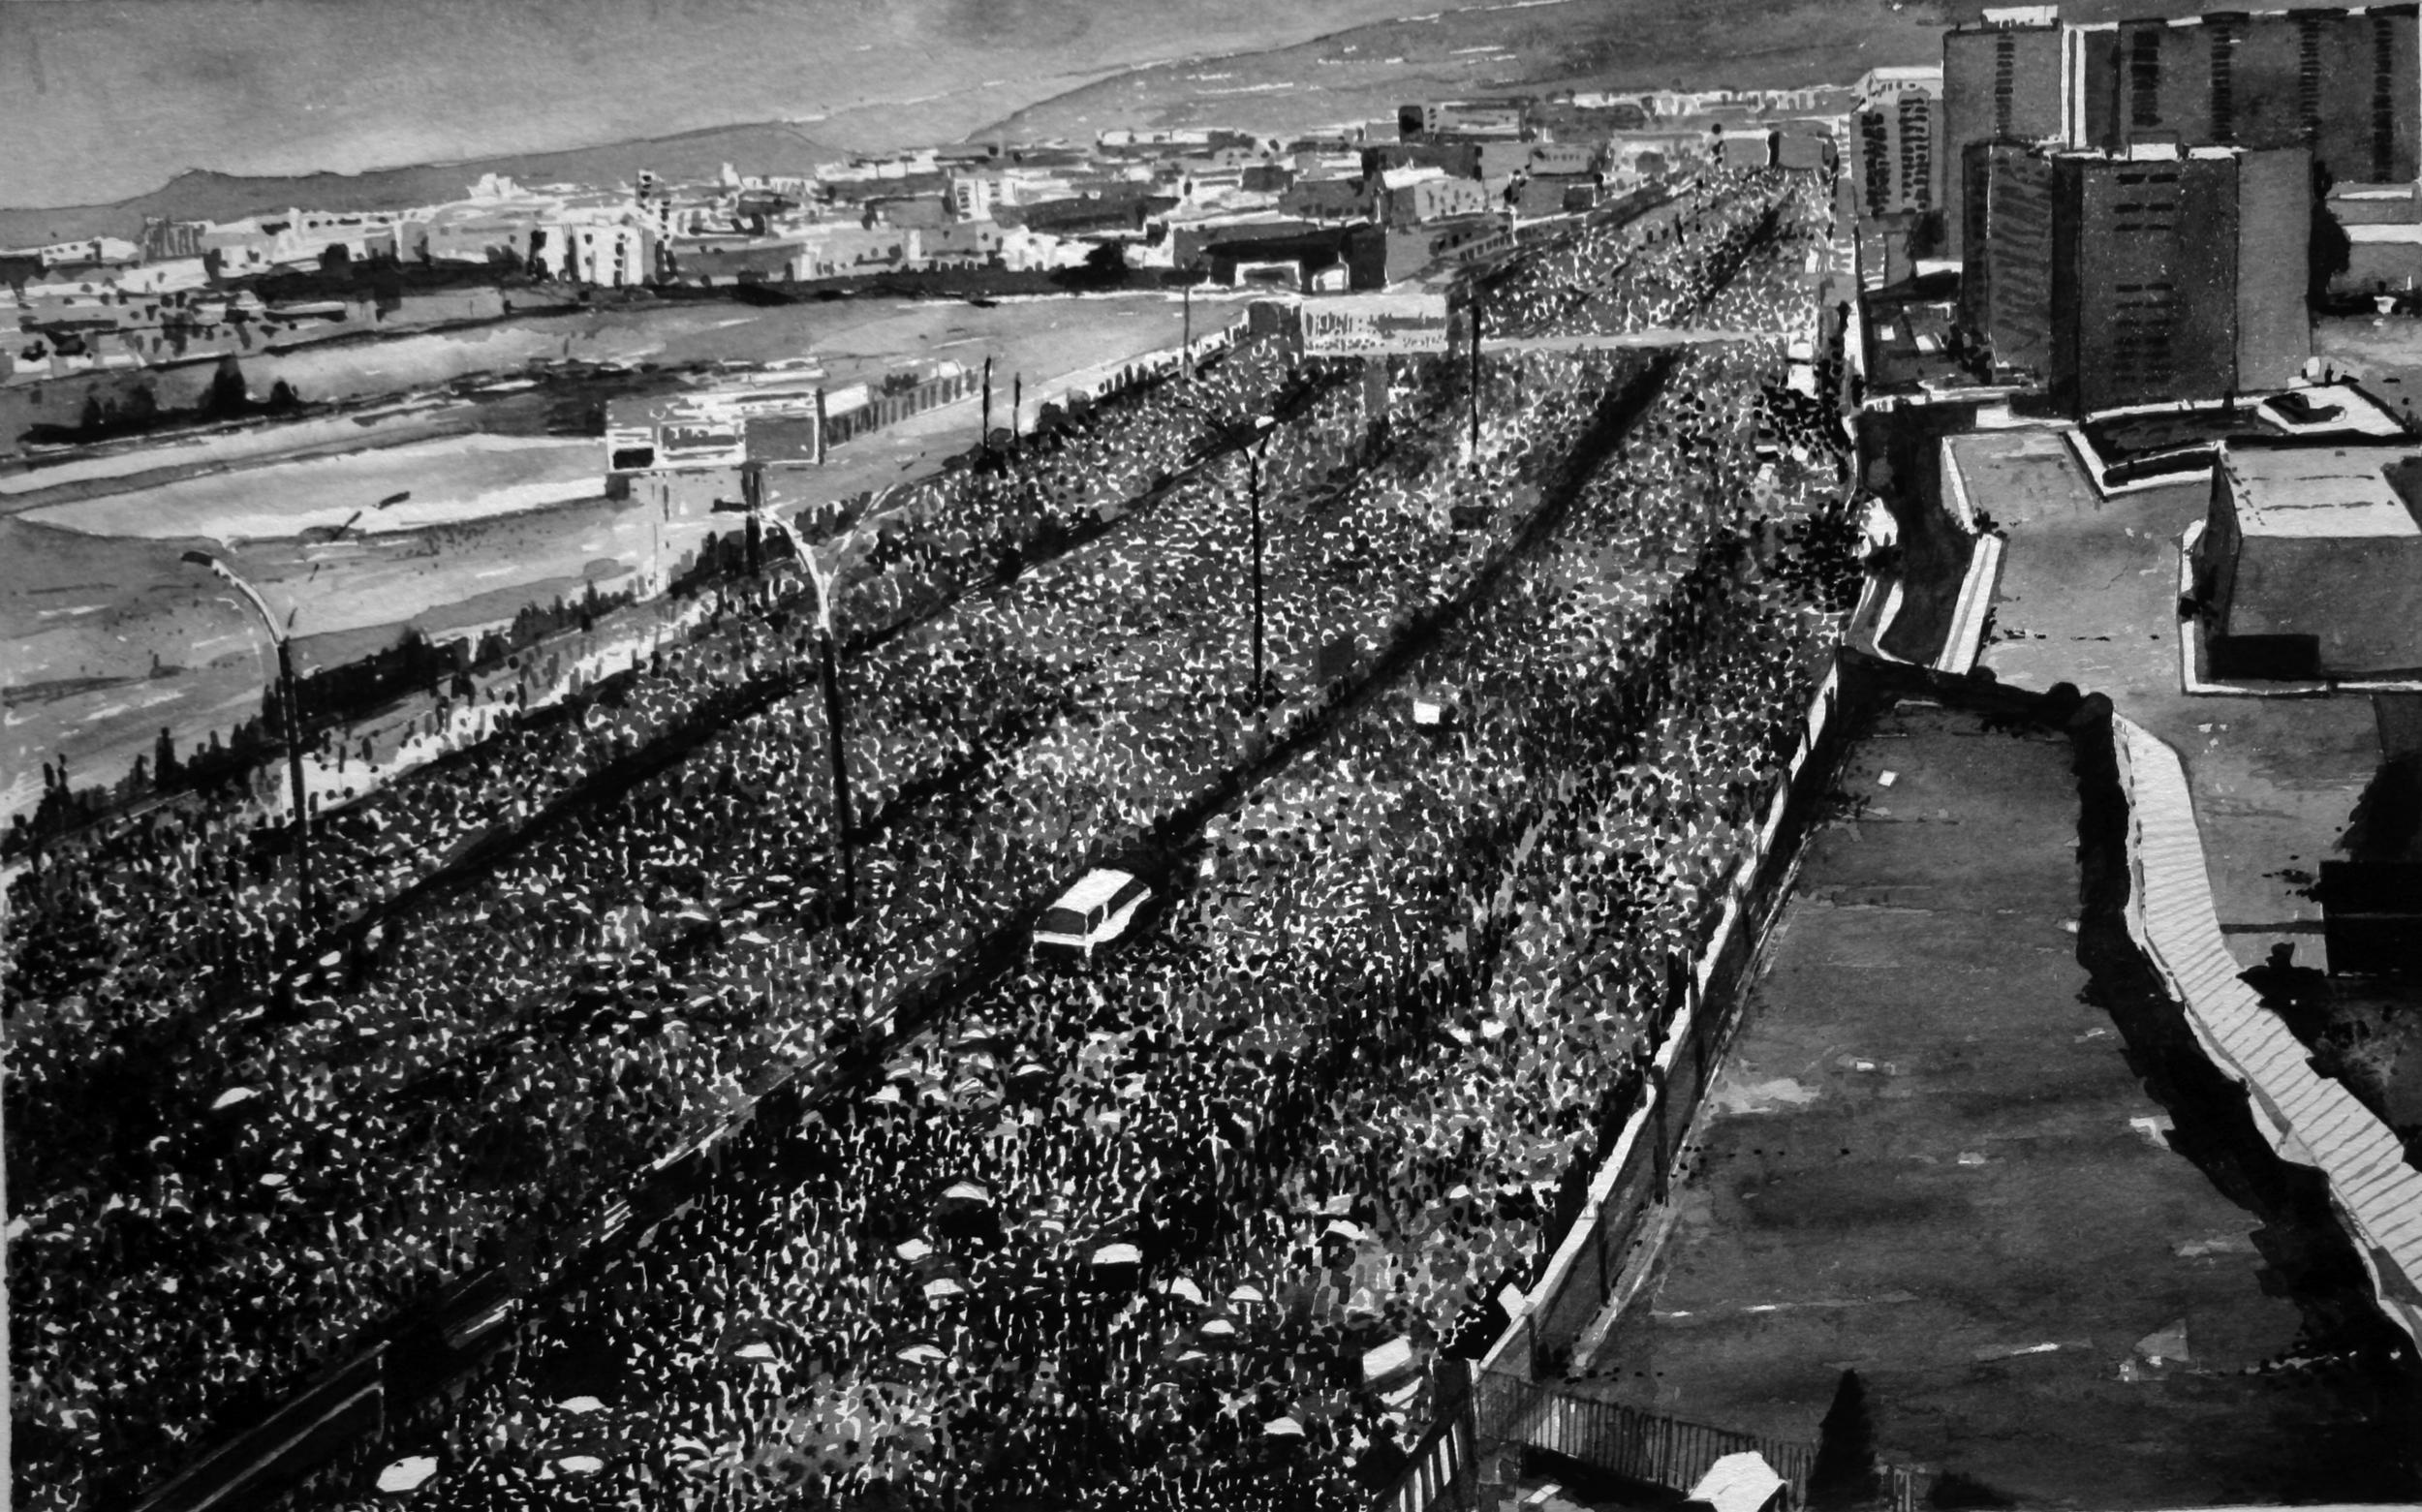 Protest Crowd, Yemen (2), ink on paper,  2012